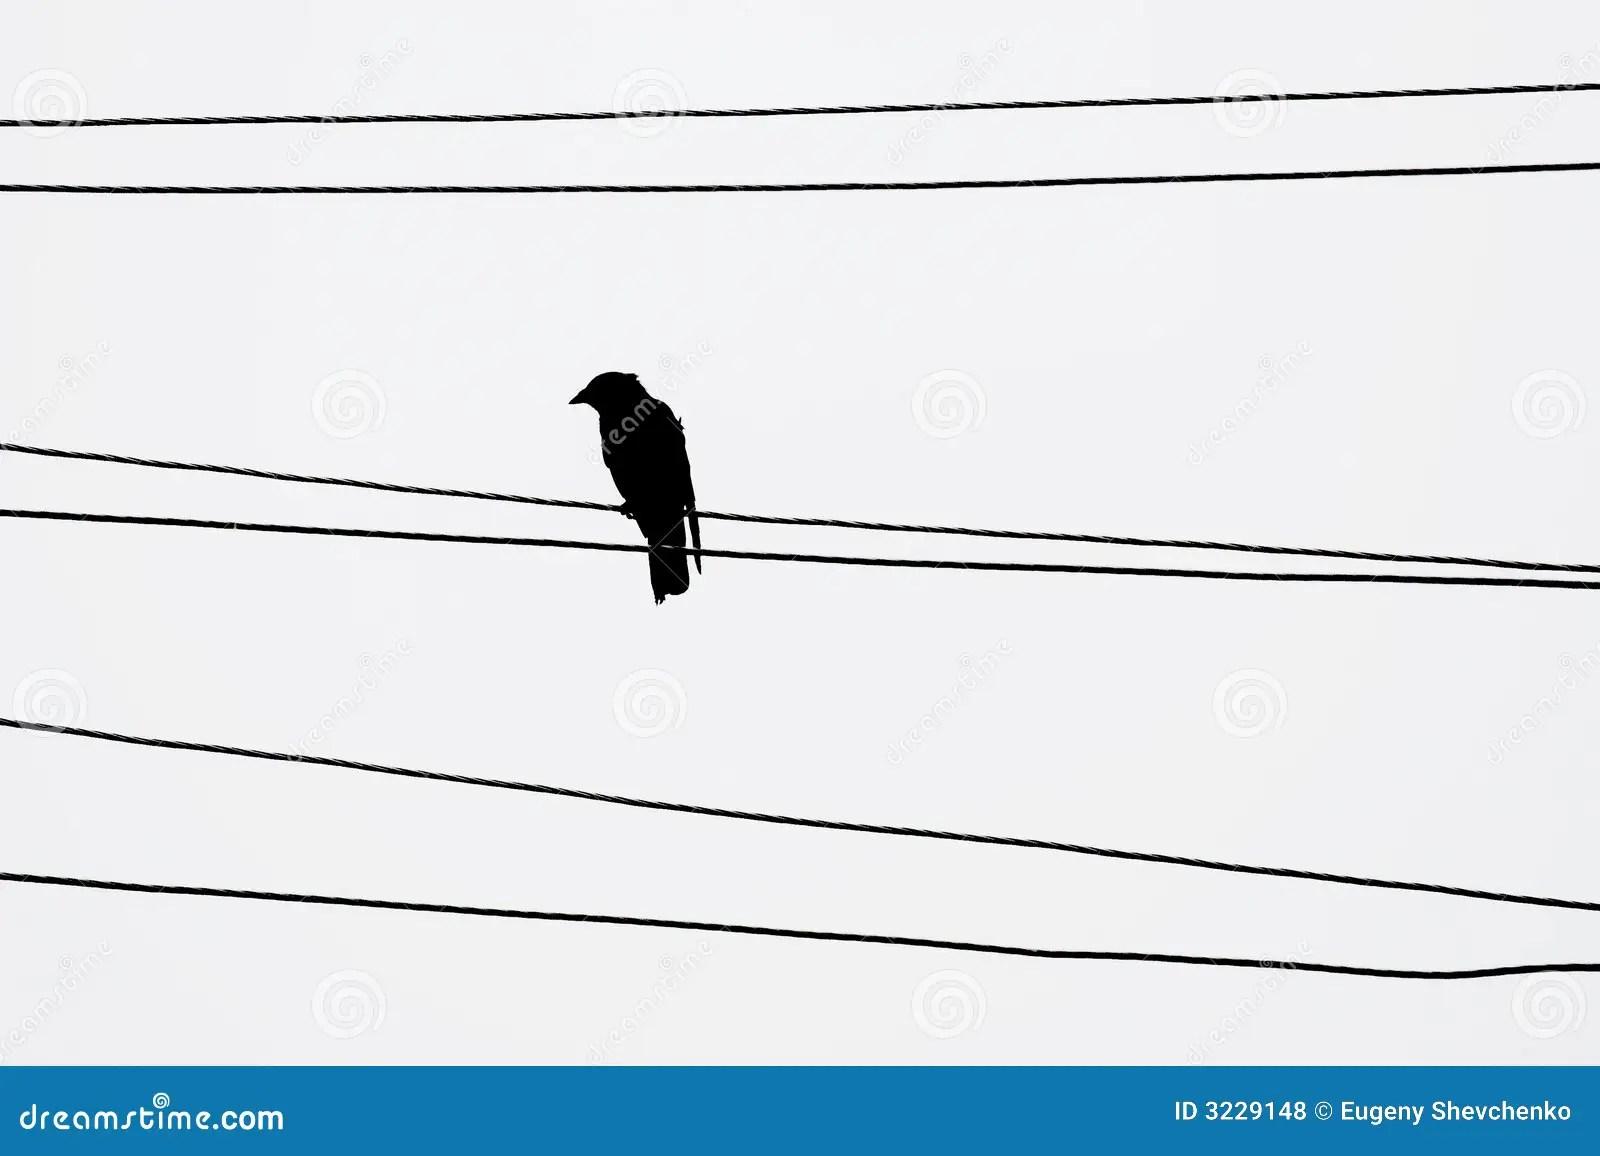 Bird stock photo. Image of wire, lead, telephone